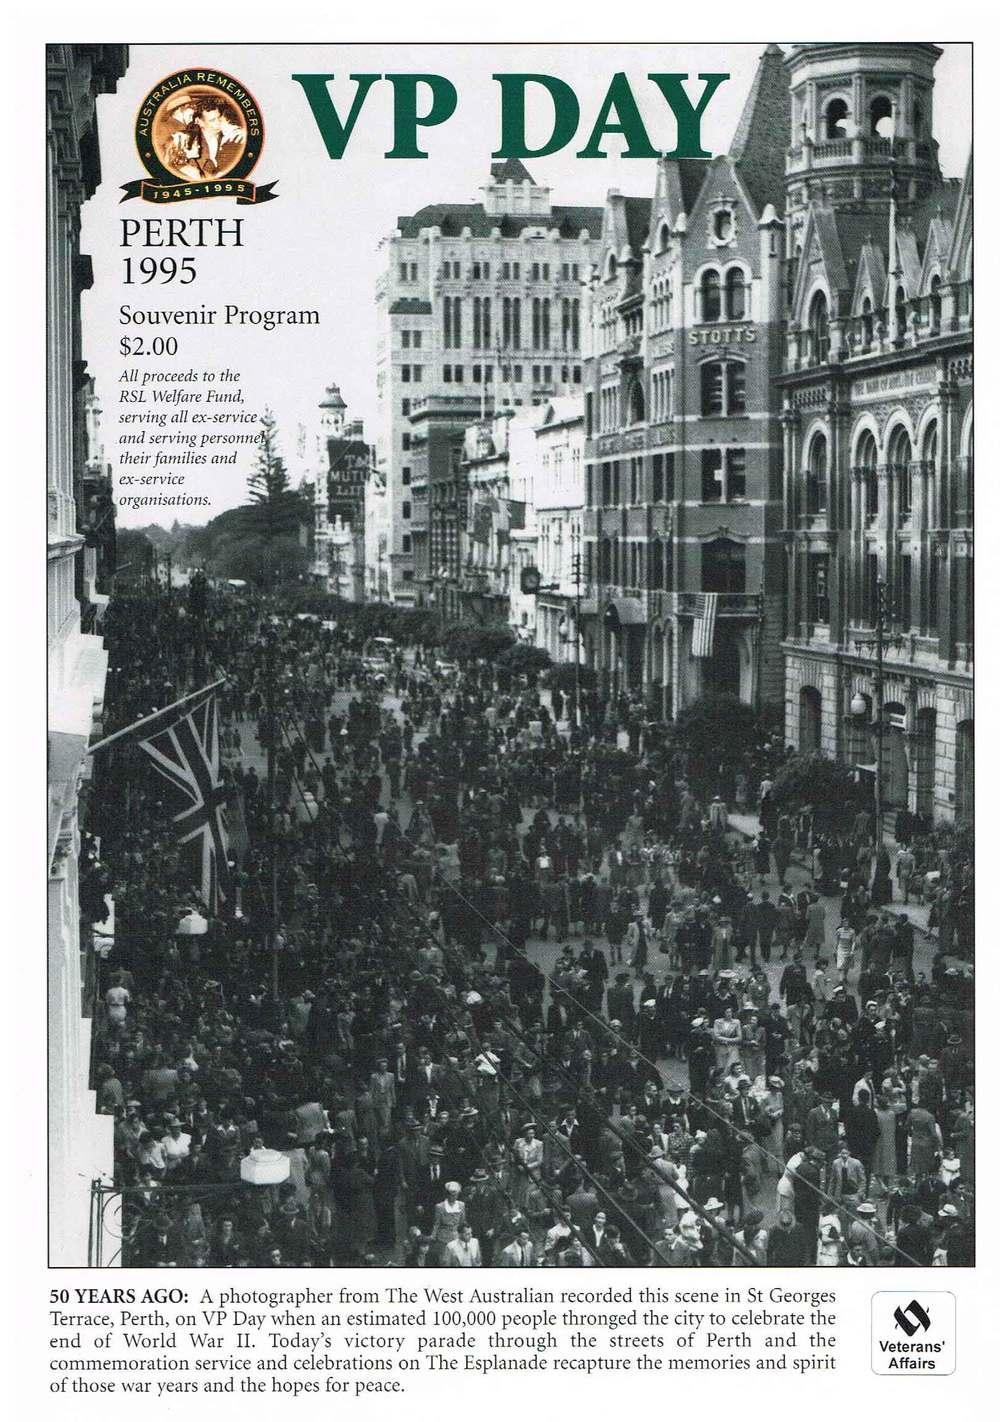 VP Day : Perth 1995 Souvenir program City of Perth